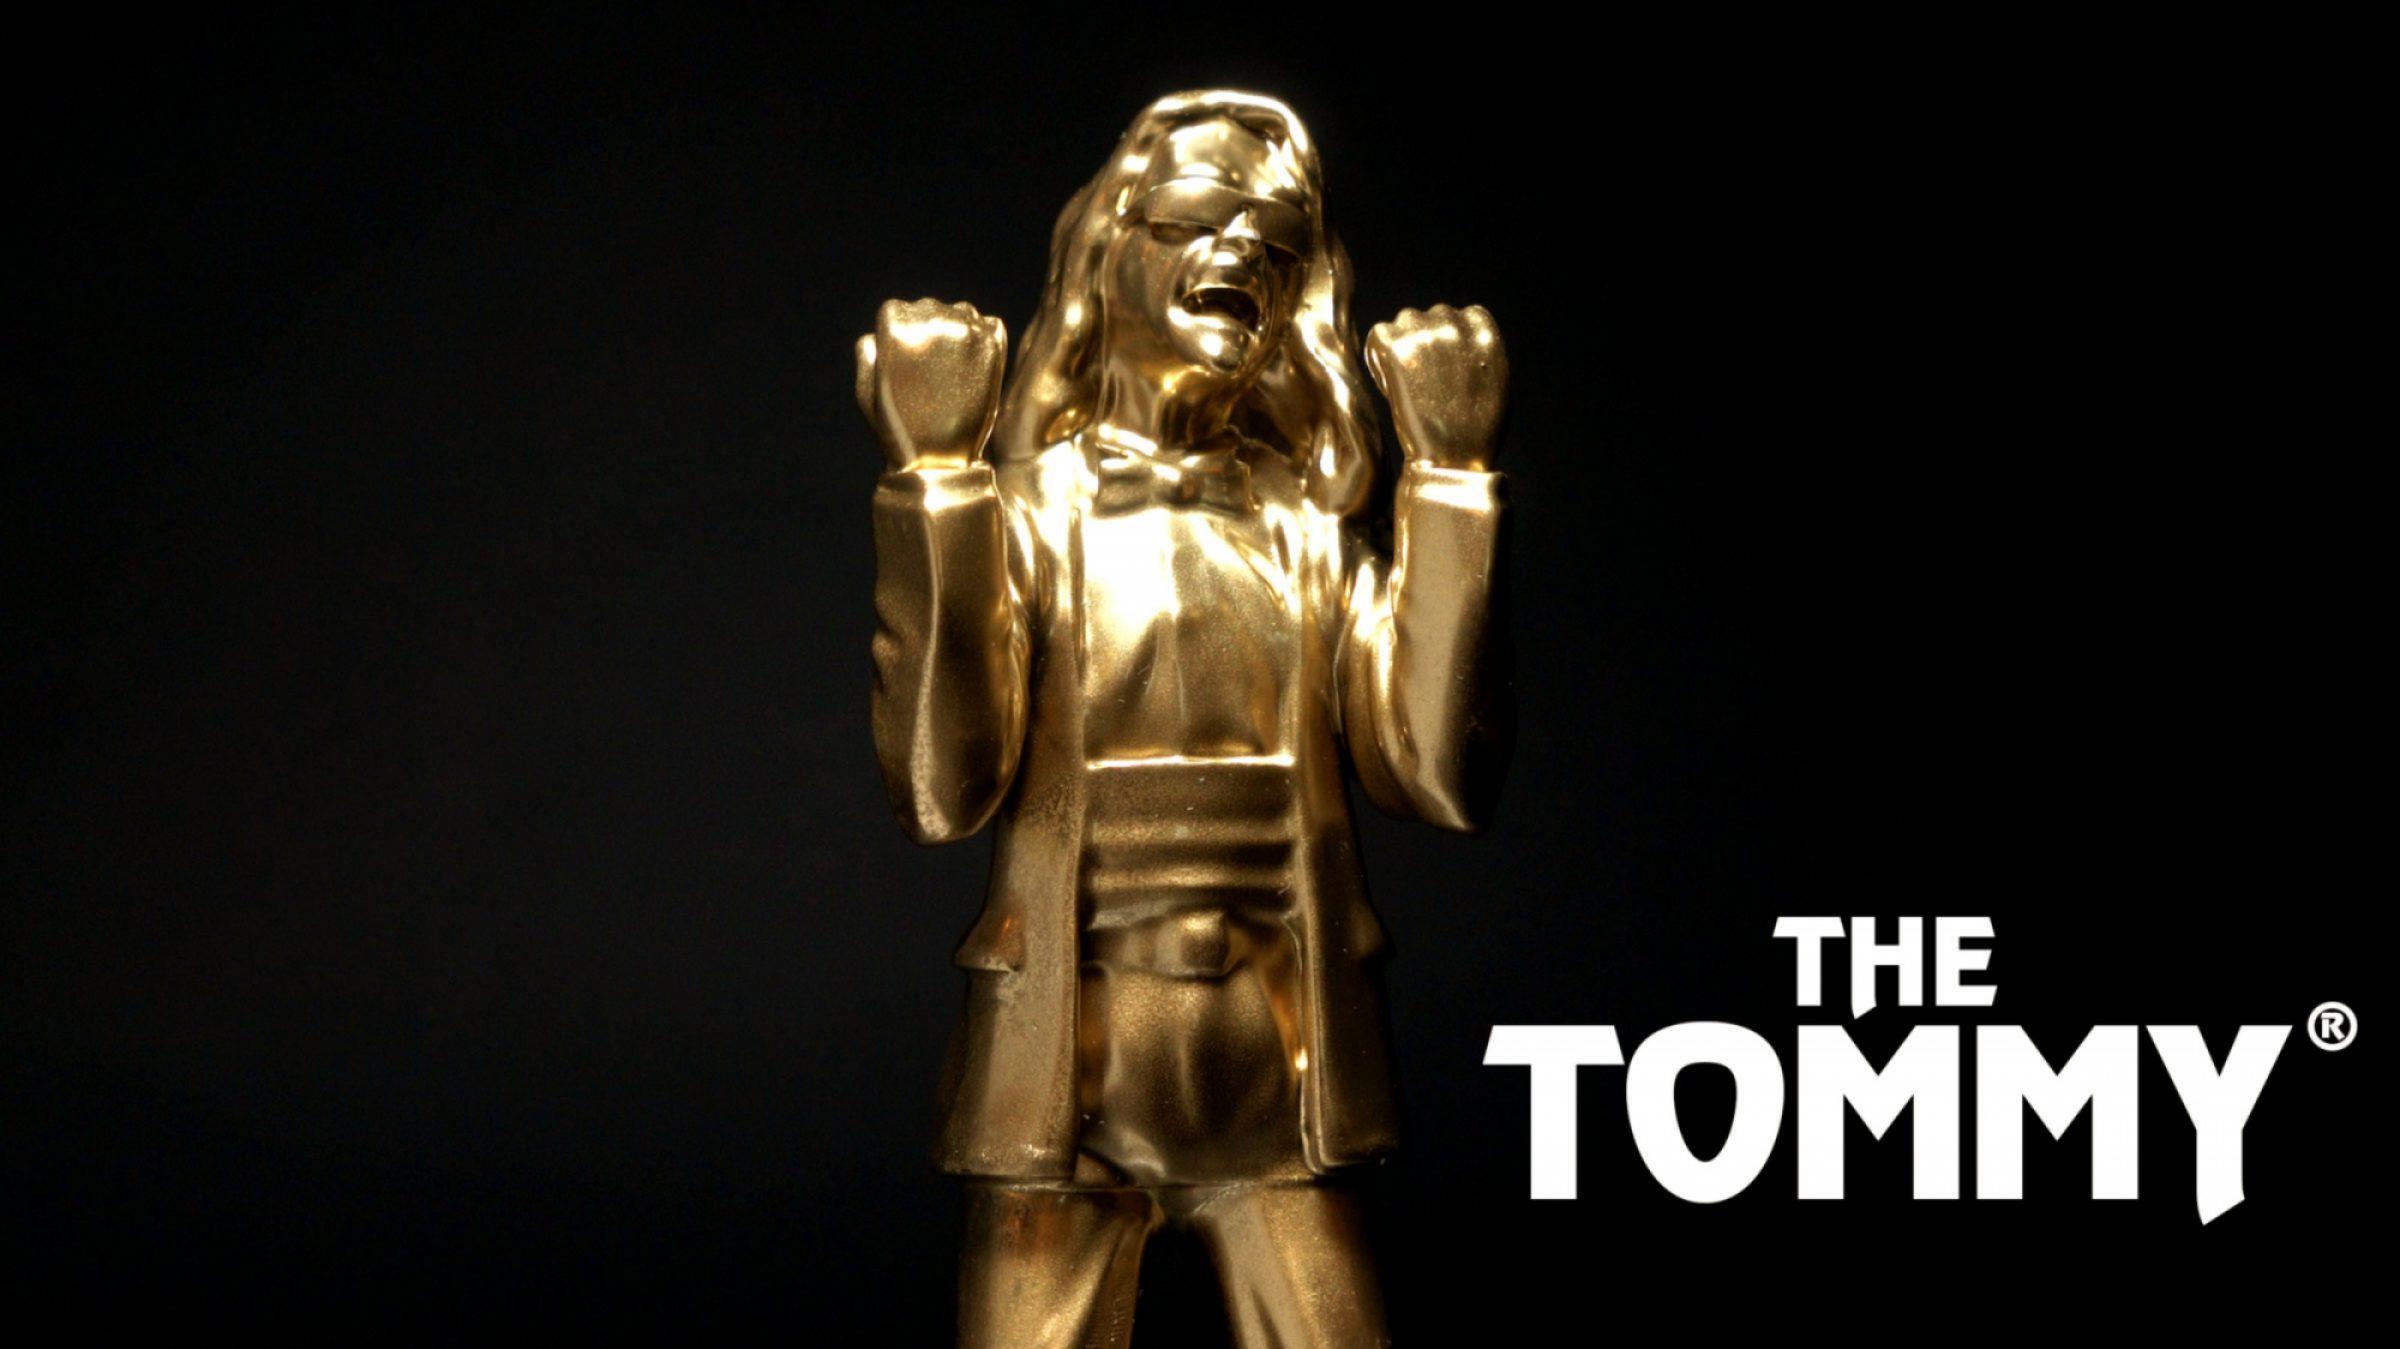 Dsa Tv30 The Tommy Award Thumbnail 3140X1764 Mt V01